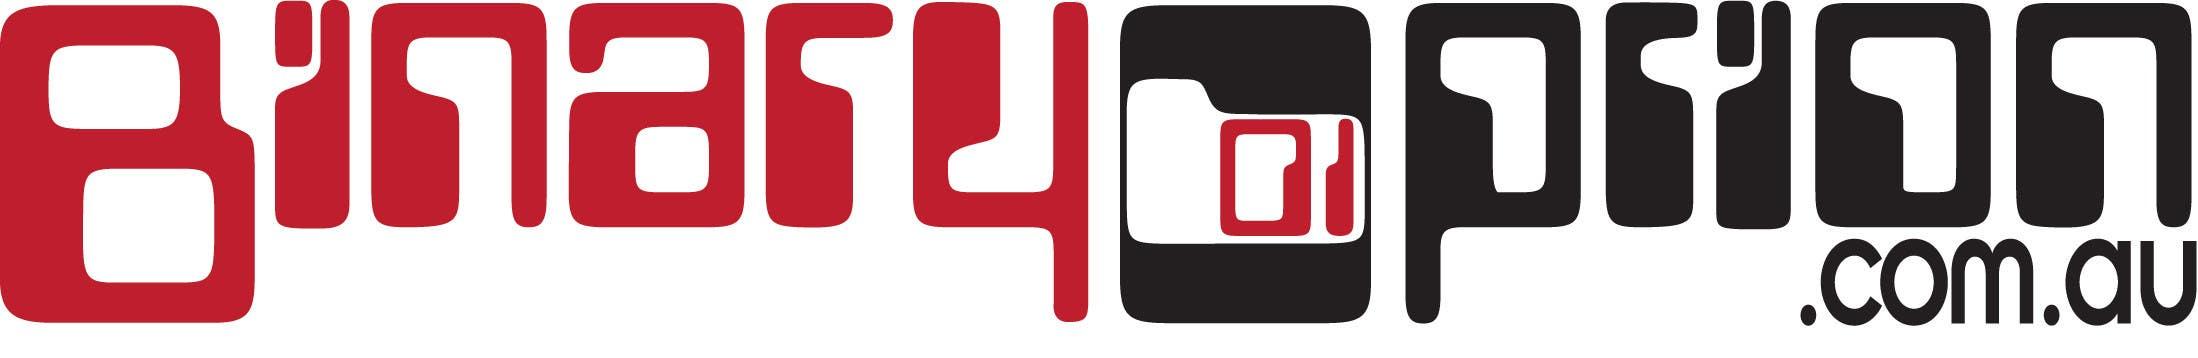 Proposition n°49 du concours Design a Logo for BinaryOption.com.au